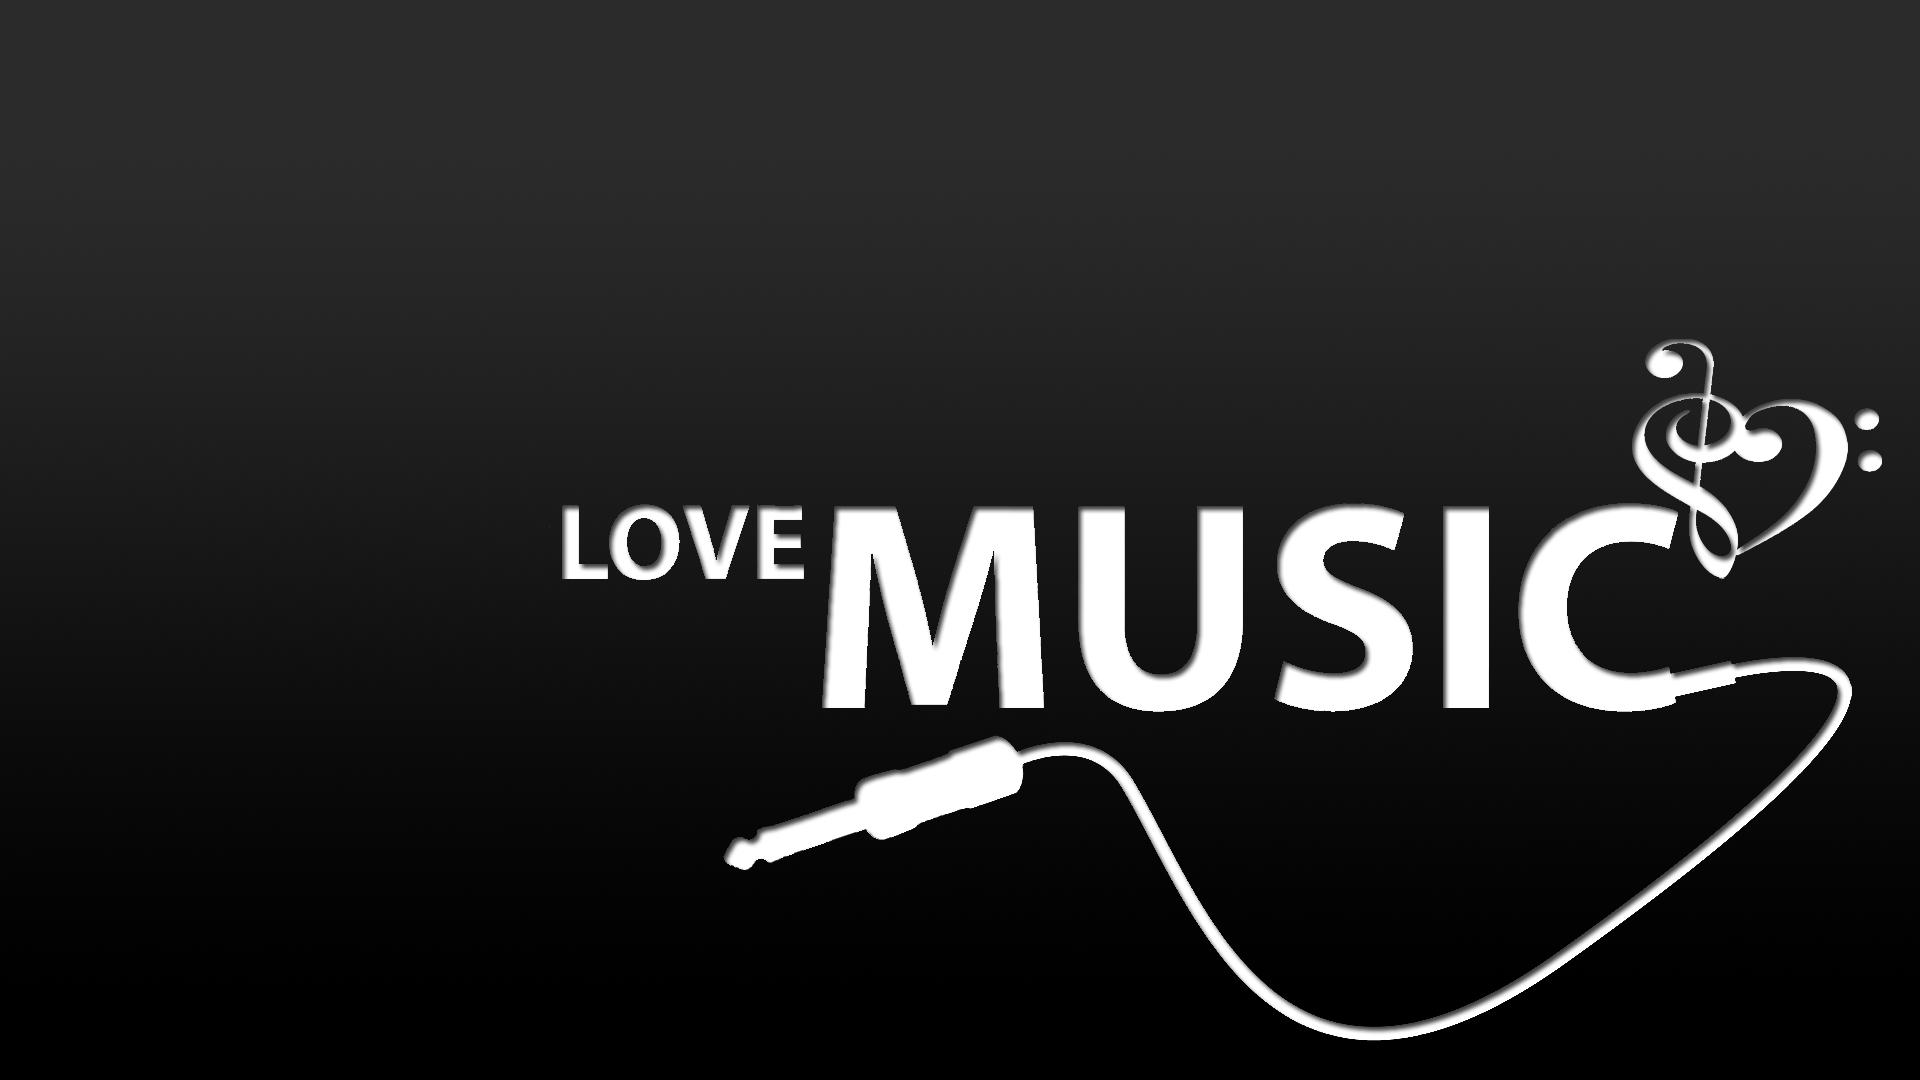 Love Music Wallpaper 1920x1080